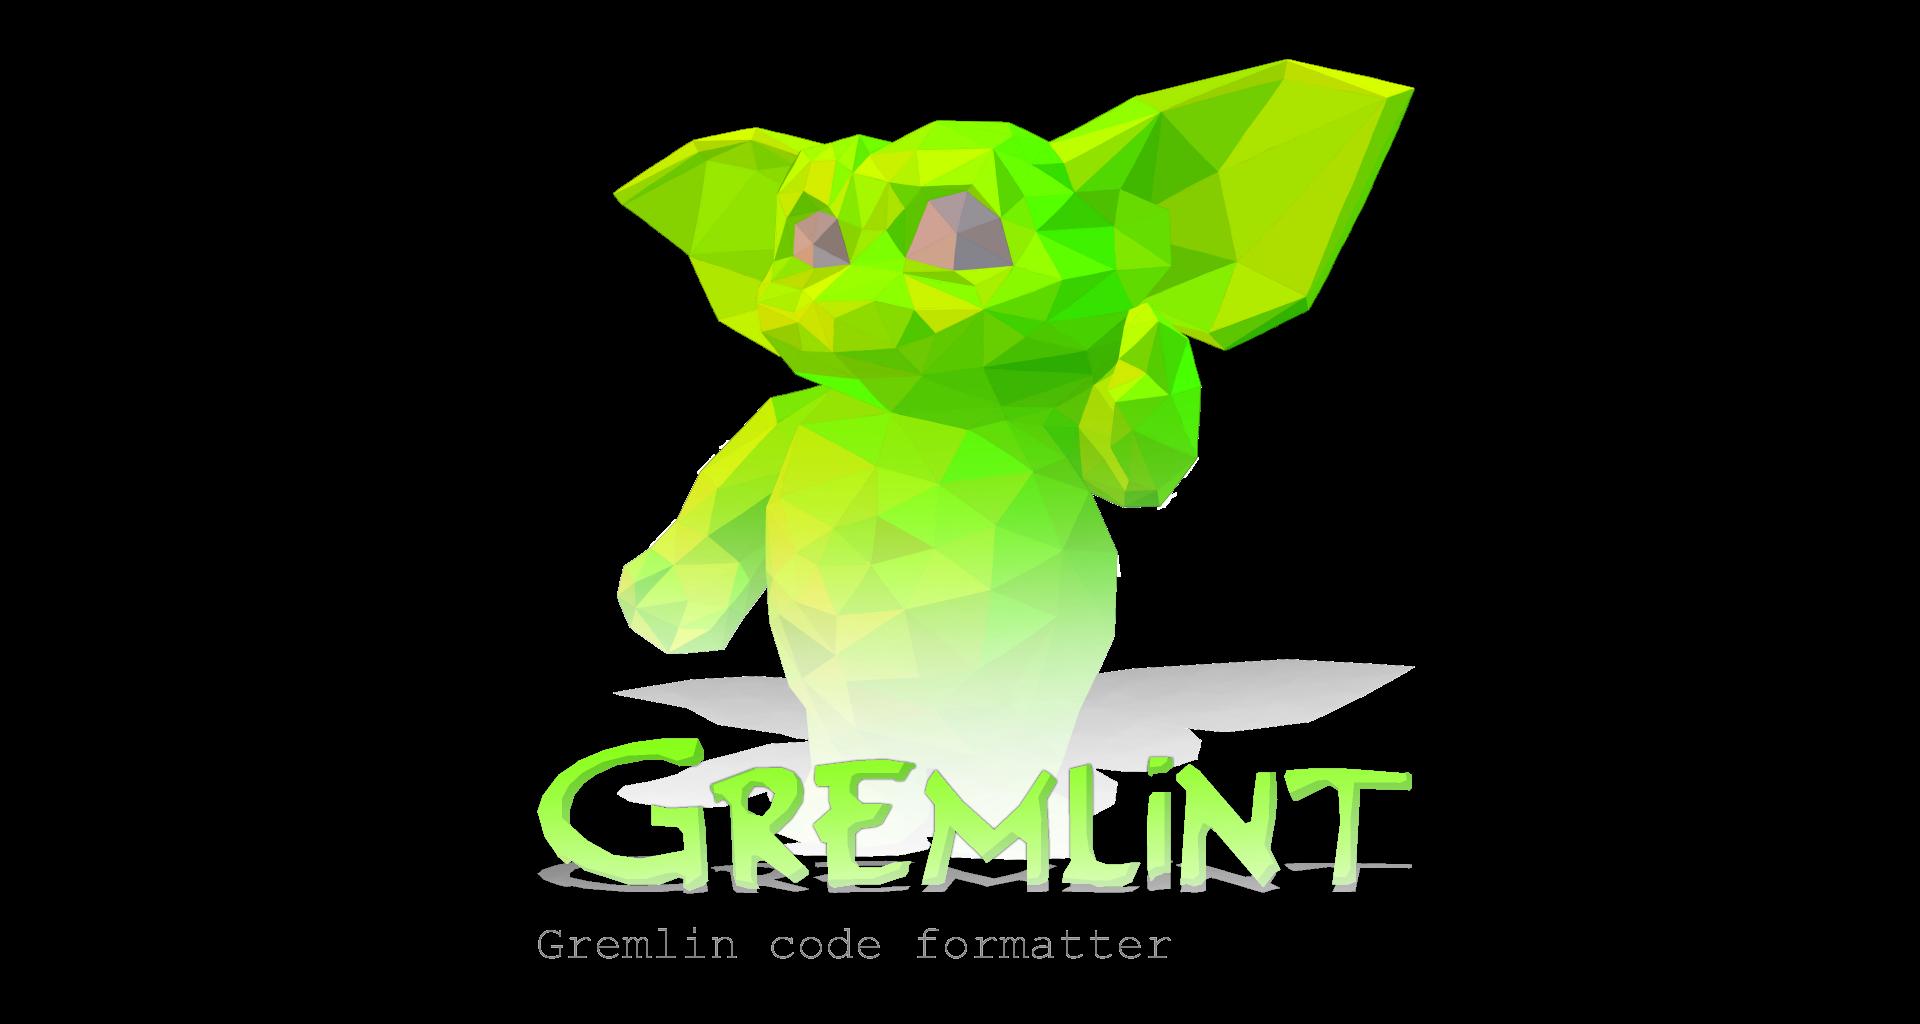 Gremlint Github Header 1920x1024